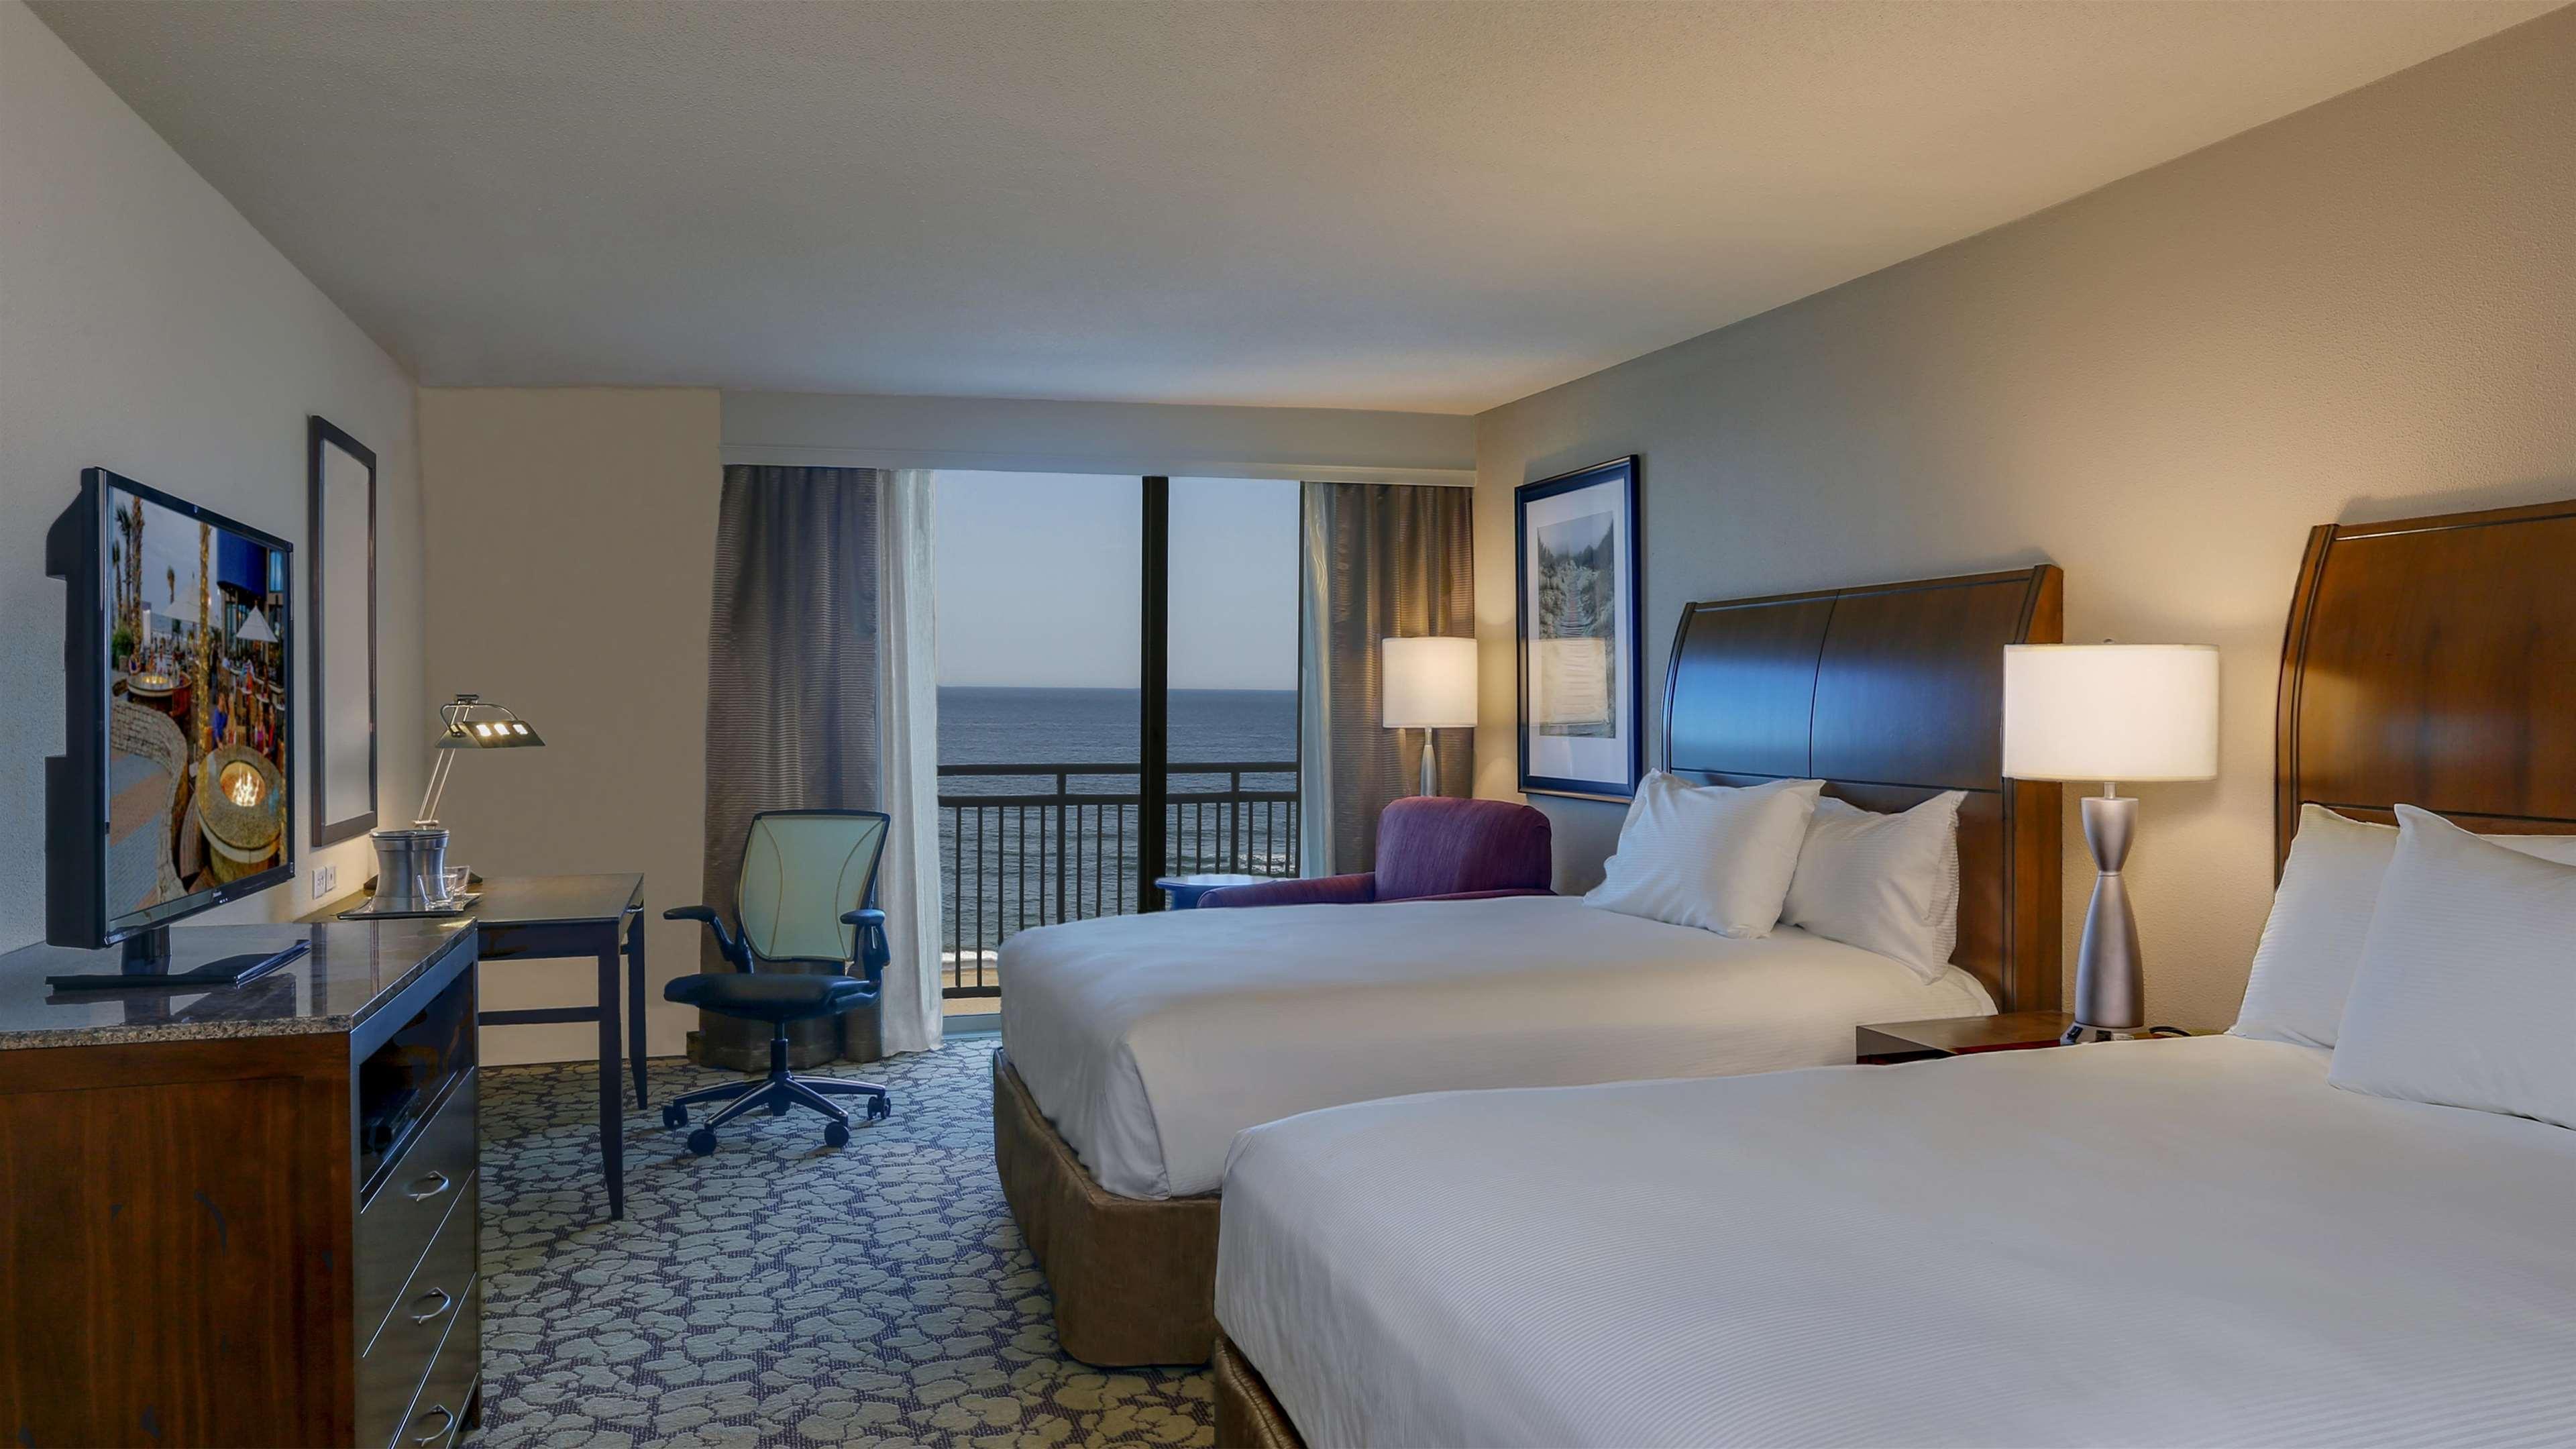 Hilton Garden Inn Virginia Beach Oceanfront image 27